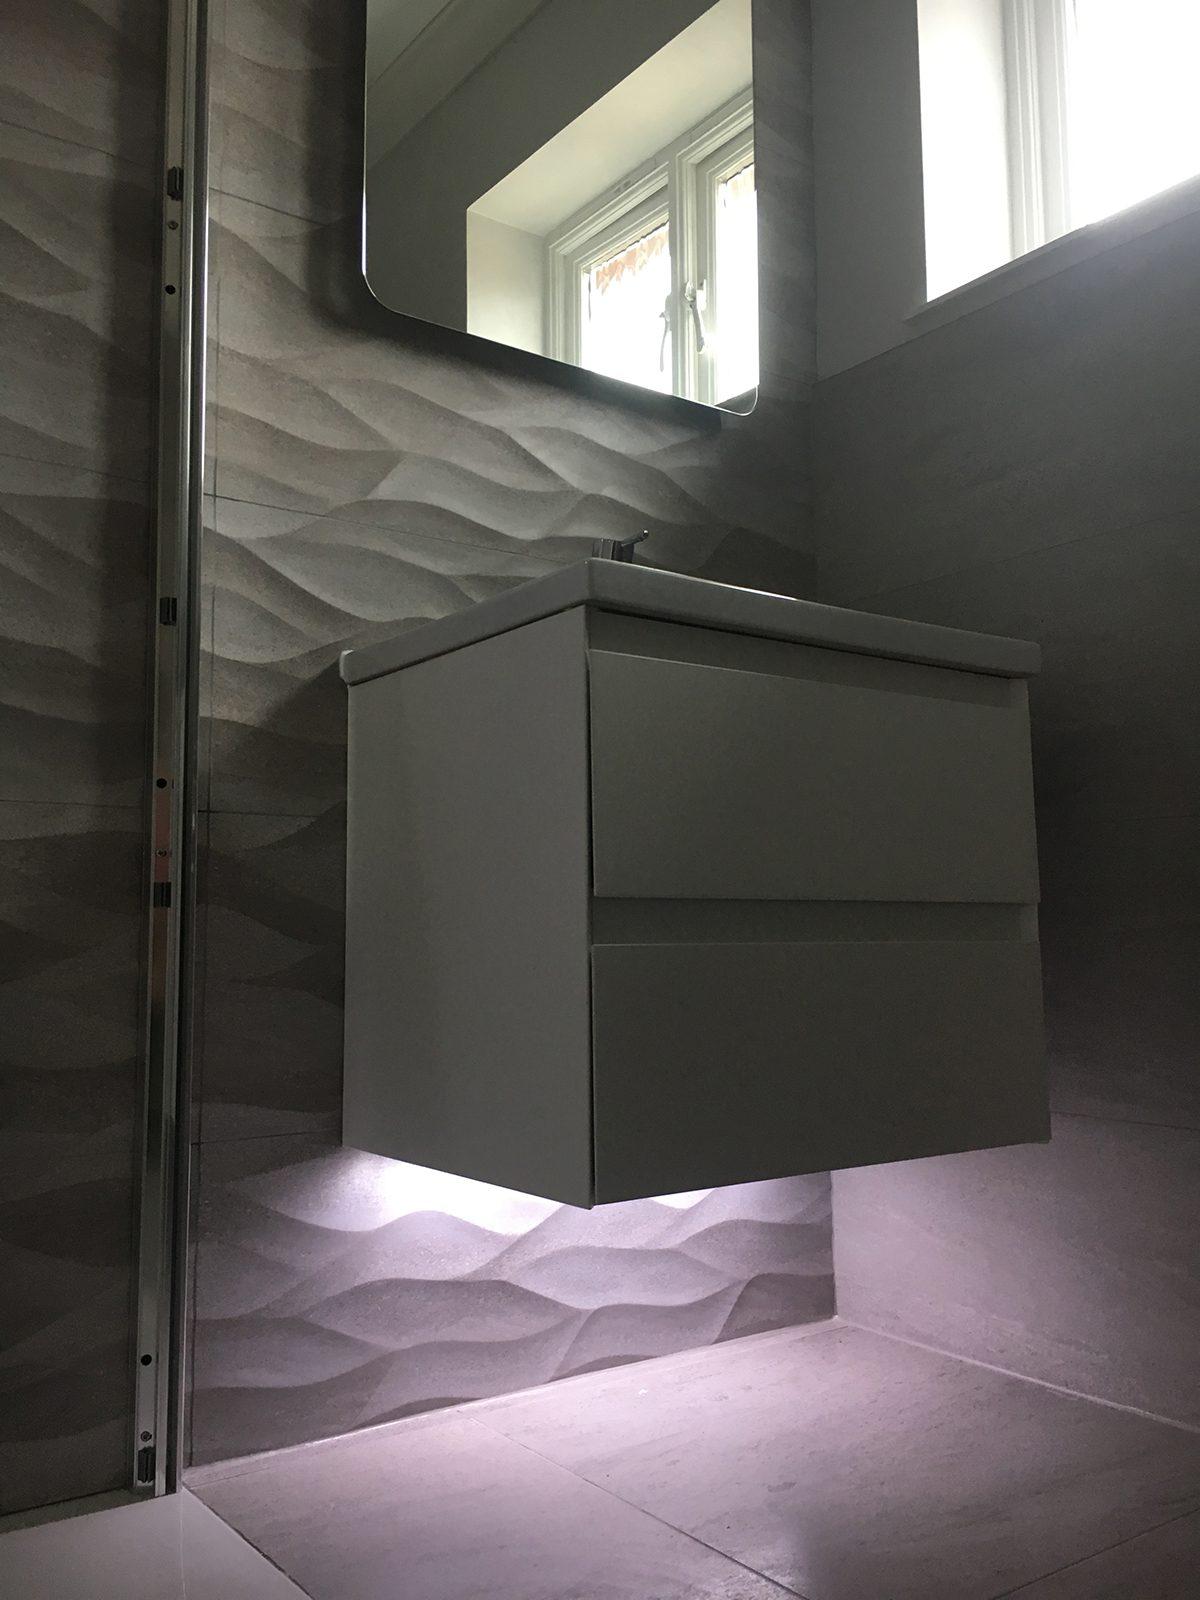 The Cambridge Bath Co bathroom storage with lighting